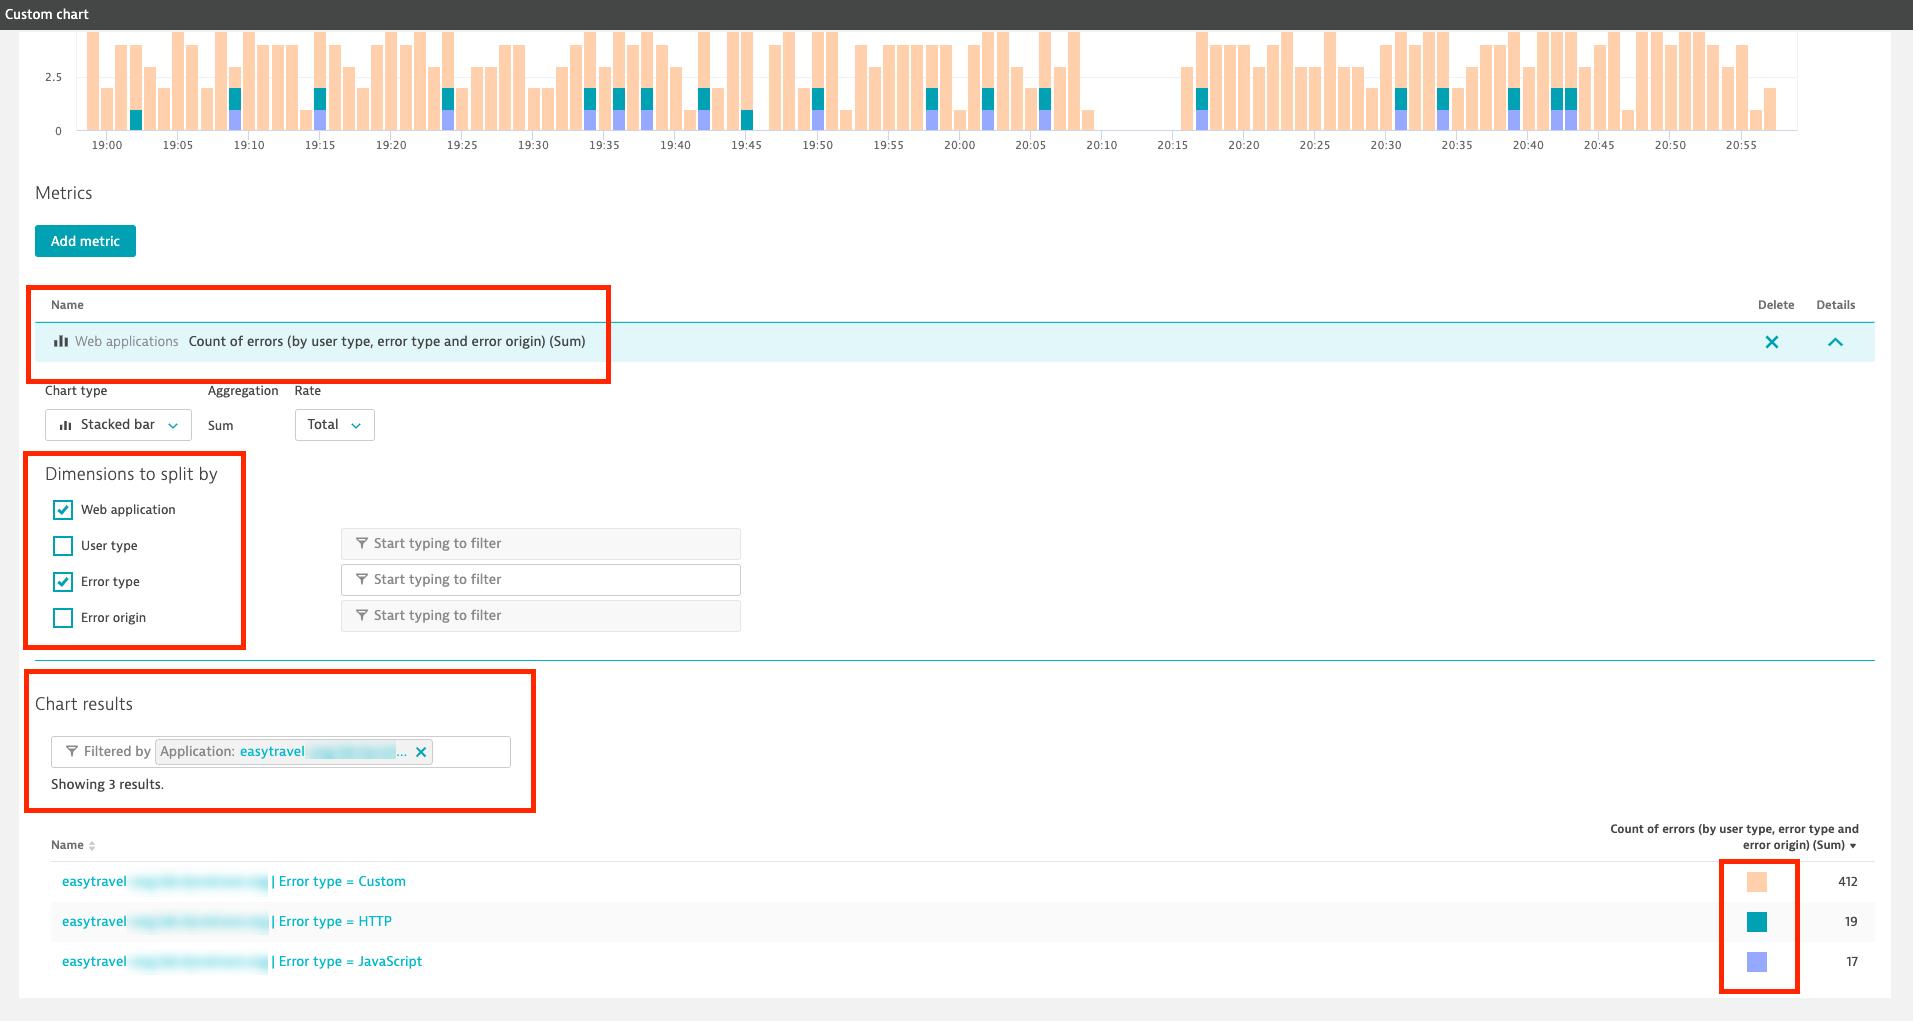 Custom chart for error count, showing metric settings